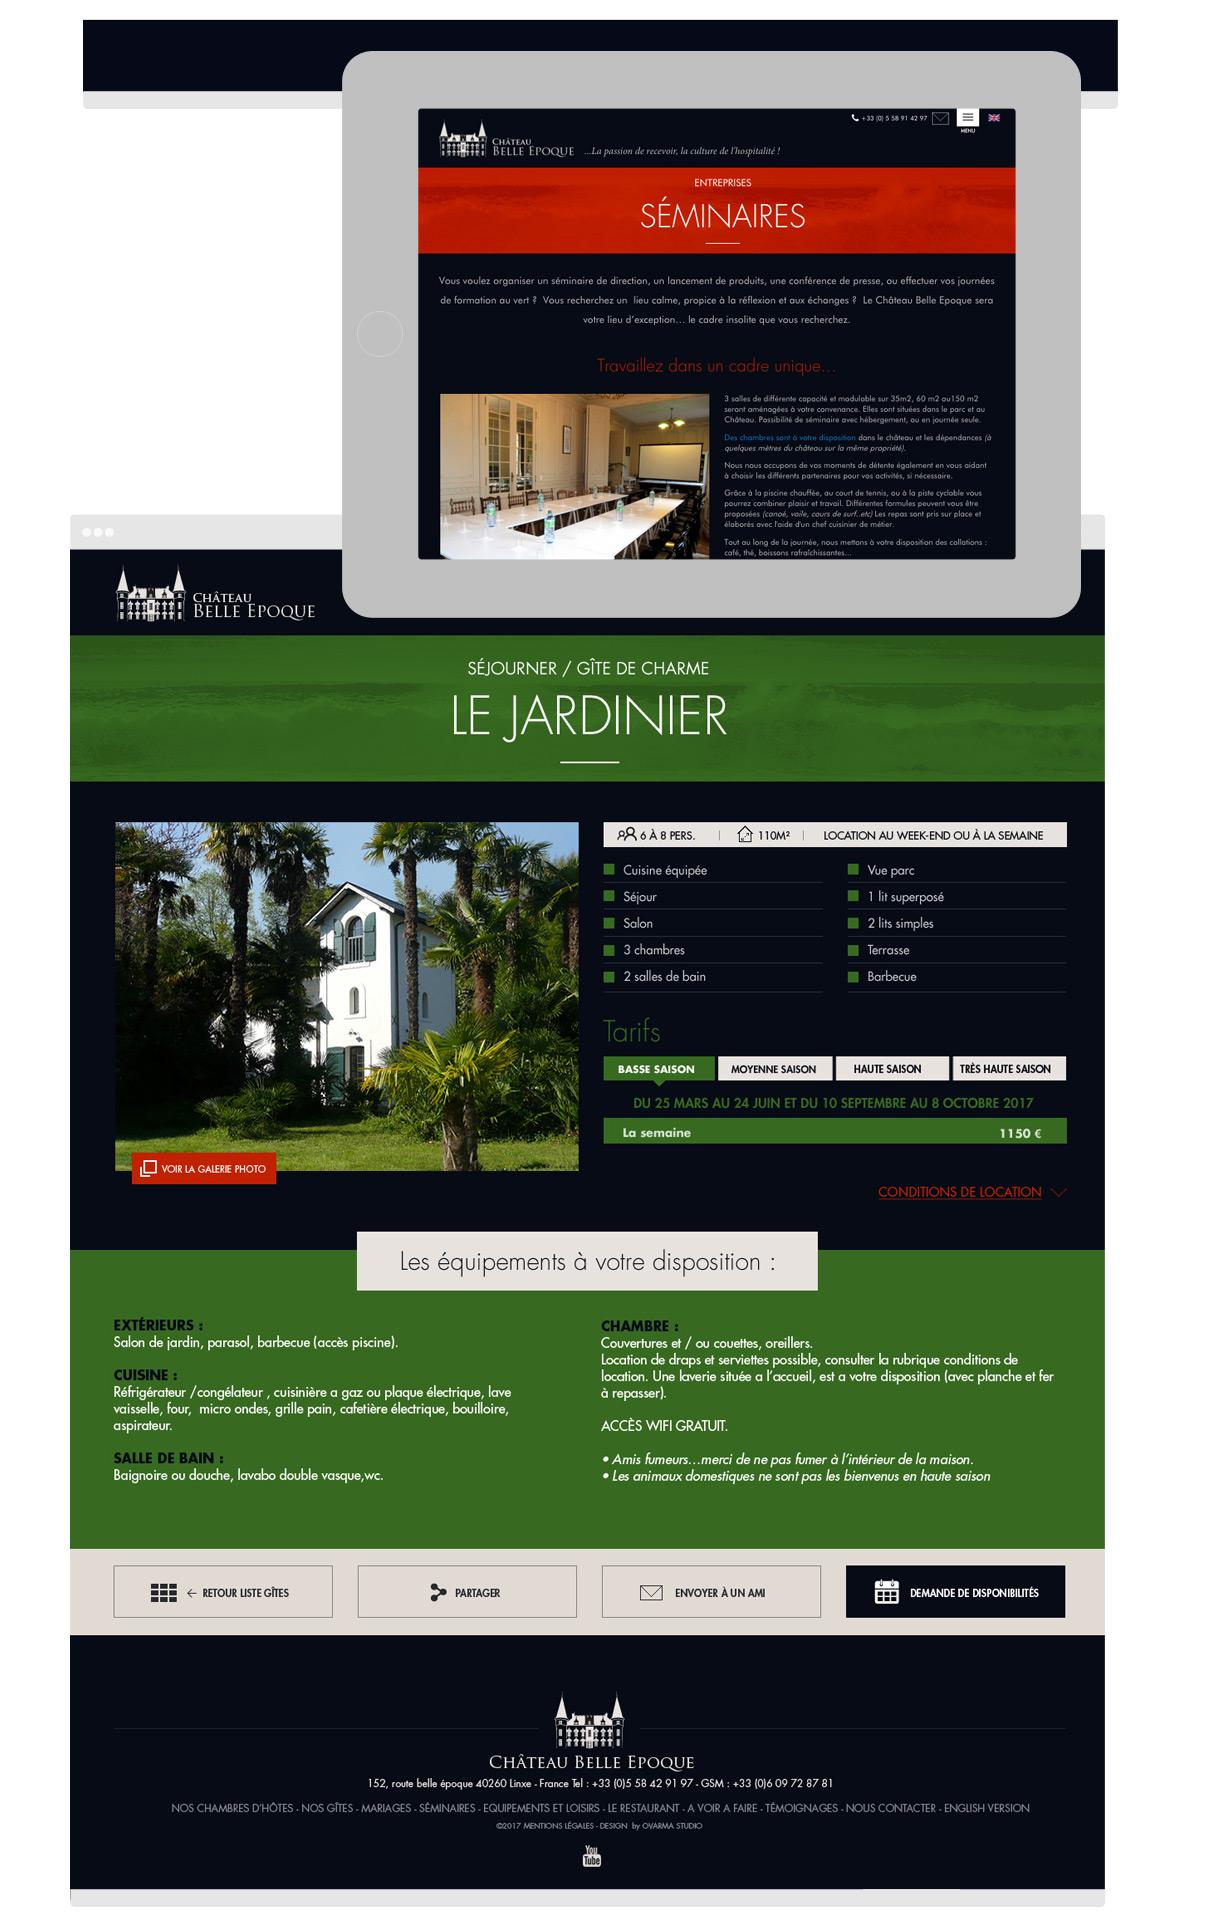 Châteaux Belle Epoque - Homepage - Olivier Varma - Directeur artistique freelance © ovarma creative studio